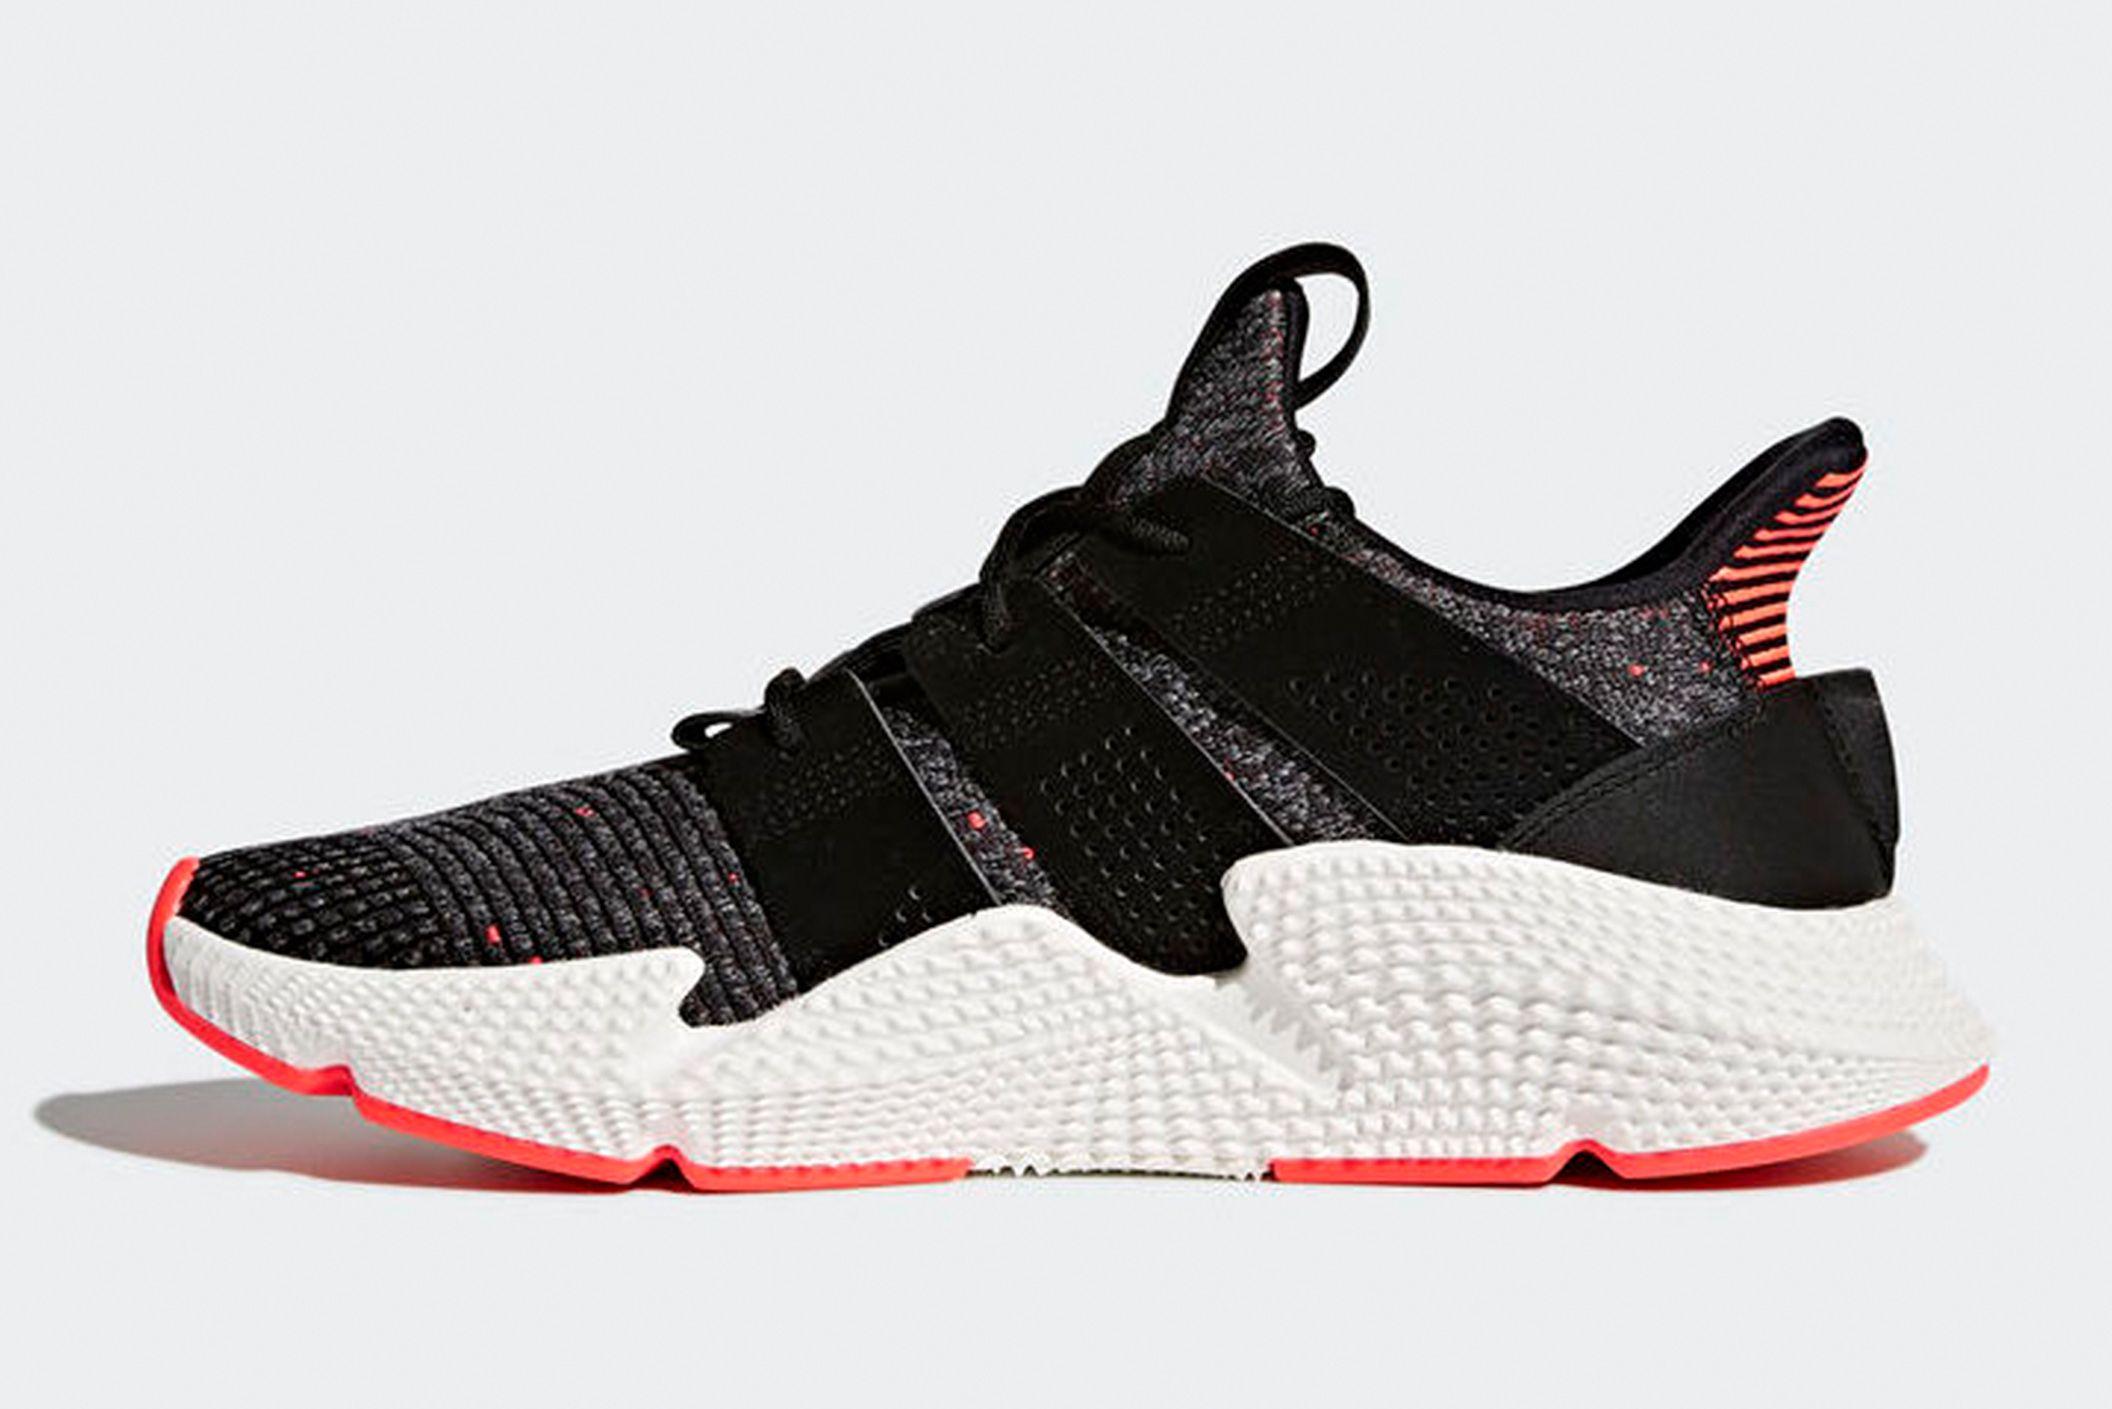 adidas prophere nucleo nero / solar scarpe rosse pinterest solare